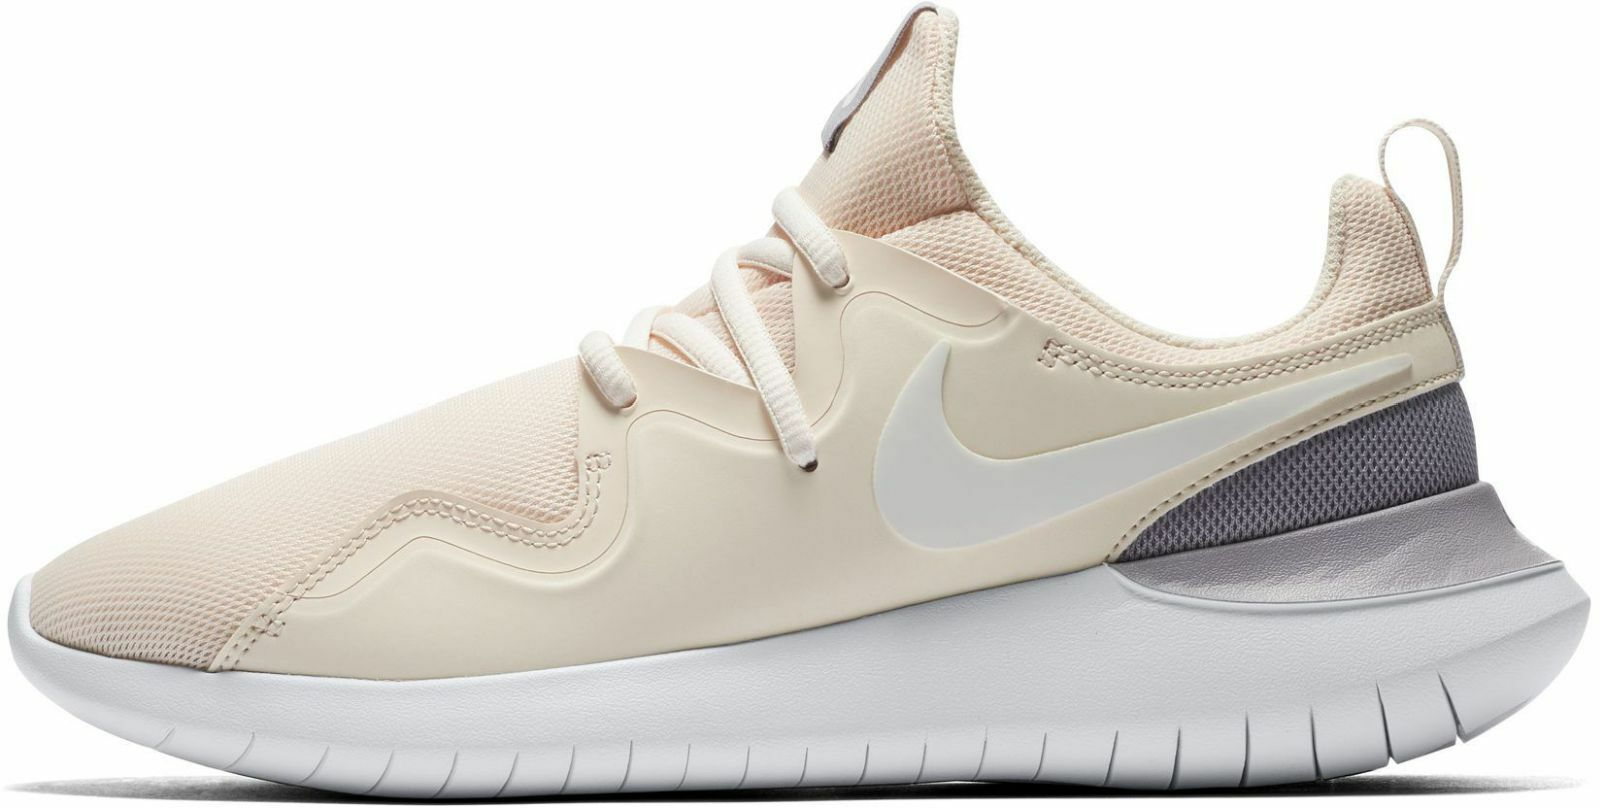 Nike Donna Scarpe per Tempo Libero Wmns Nike Tessen Rosa